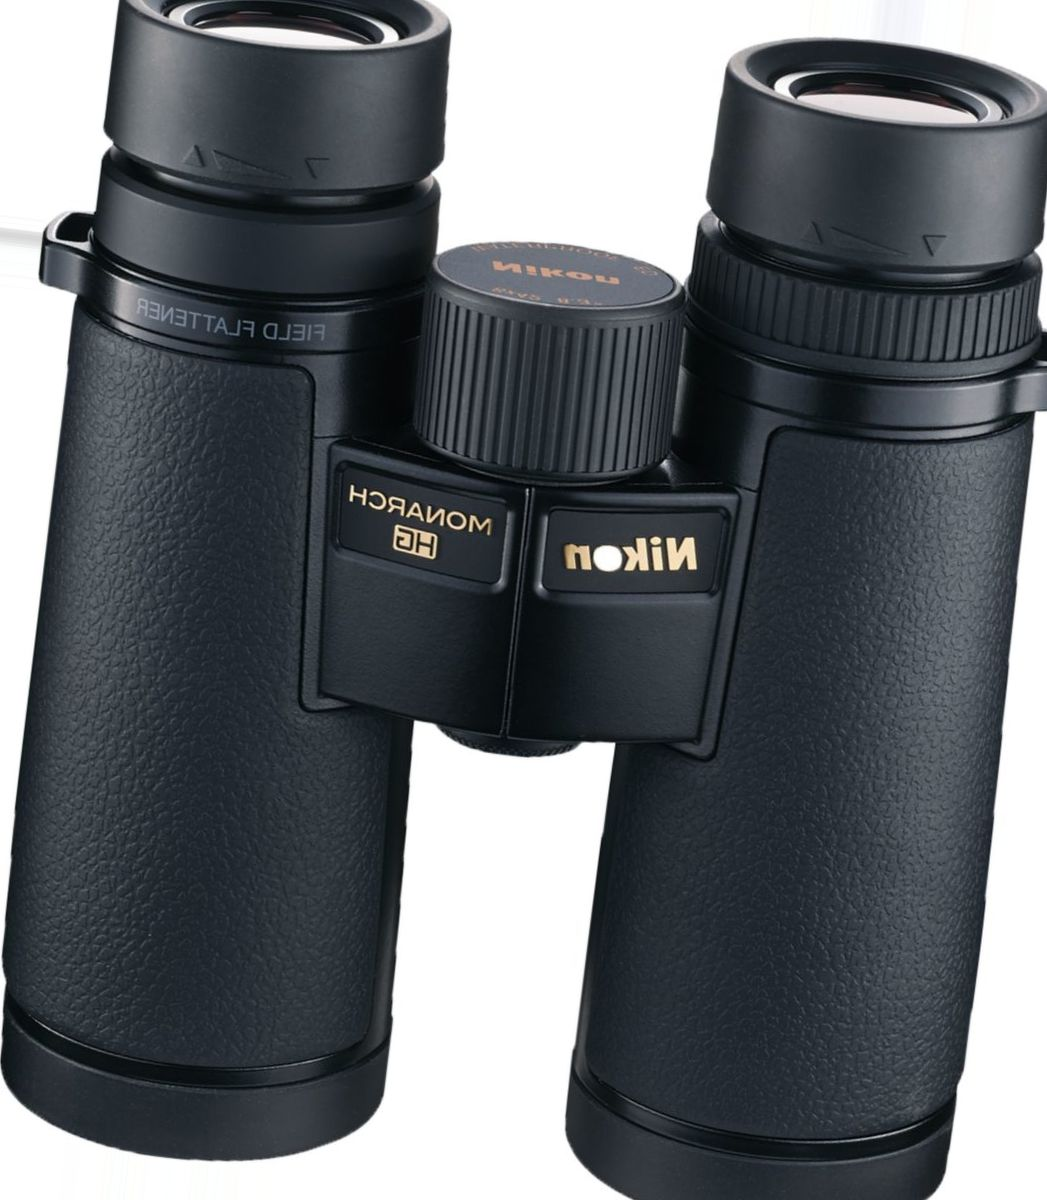 Nikon MONARCH HG 8x42 Binoculars